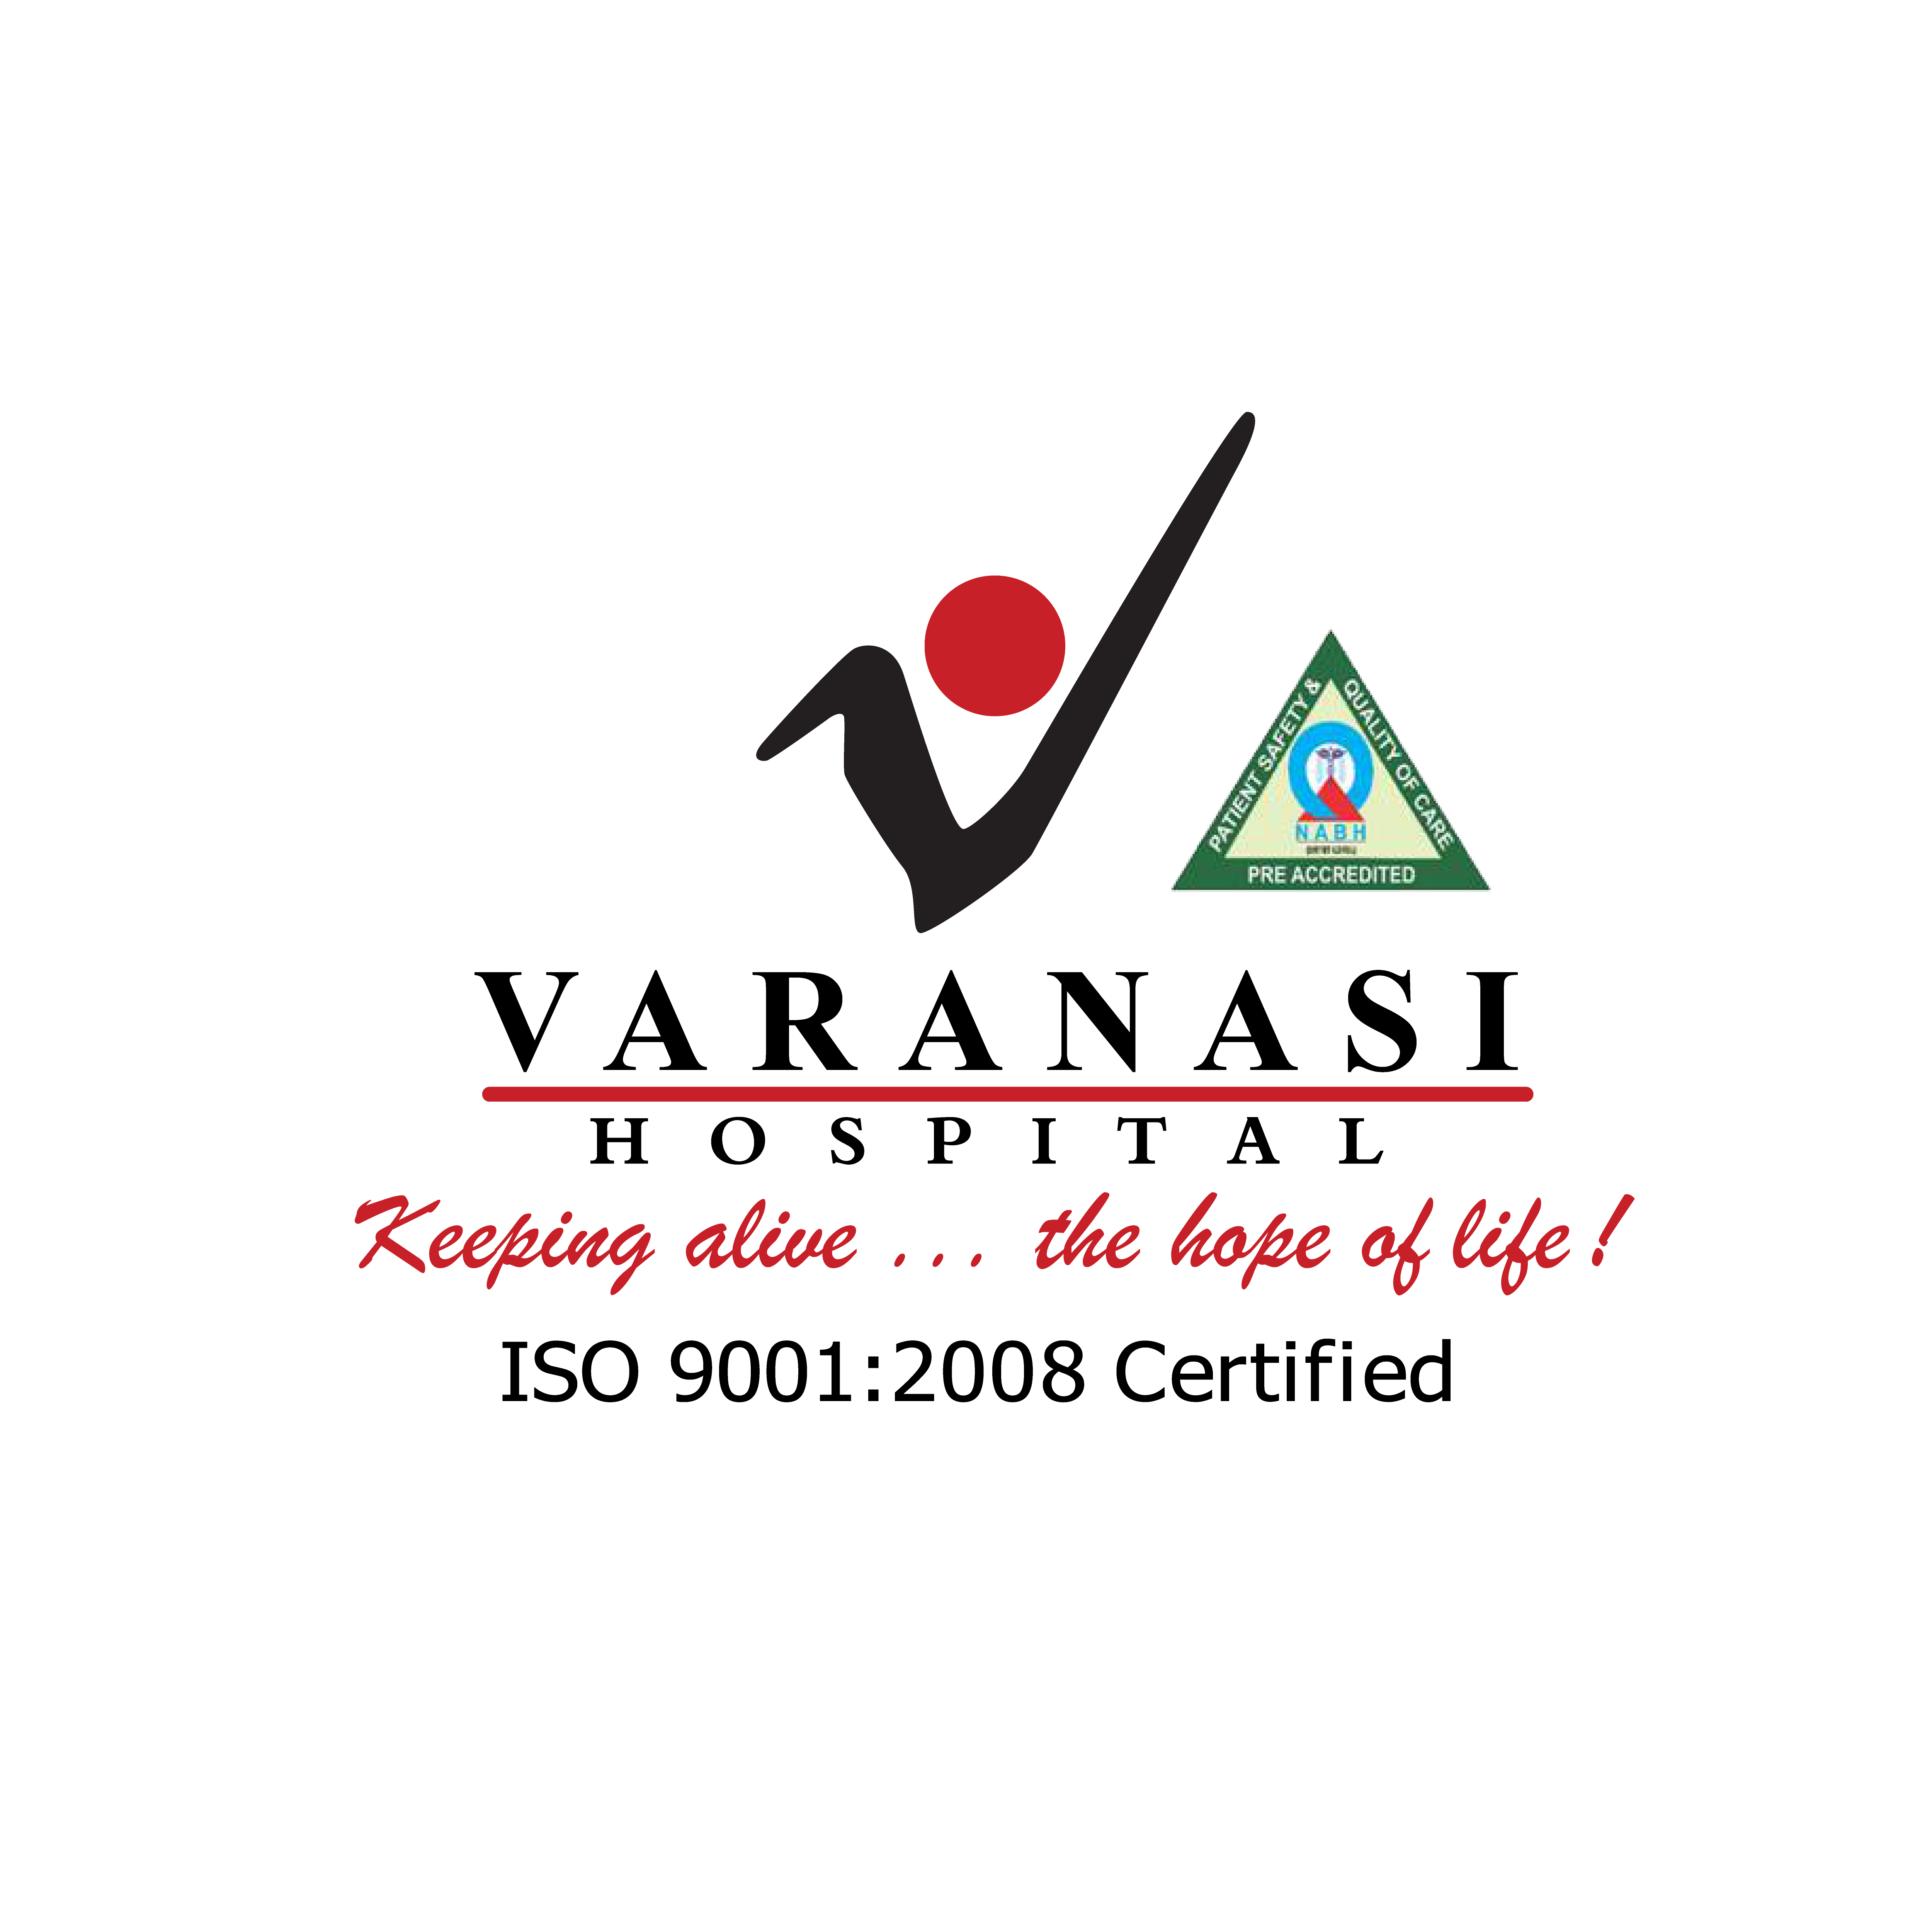 Varanasi Hospital